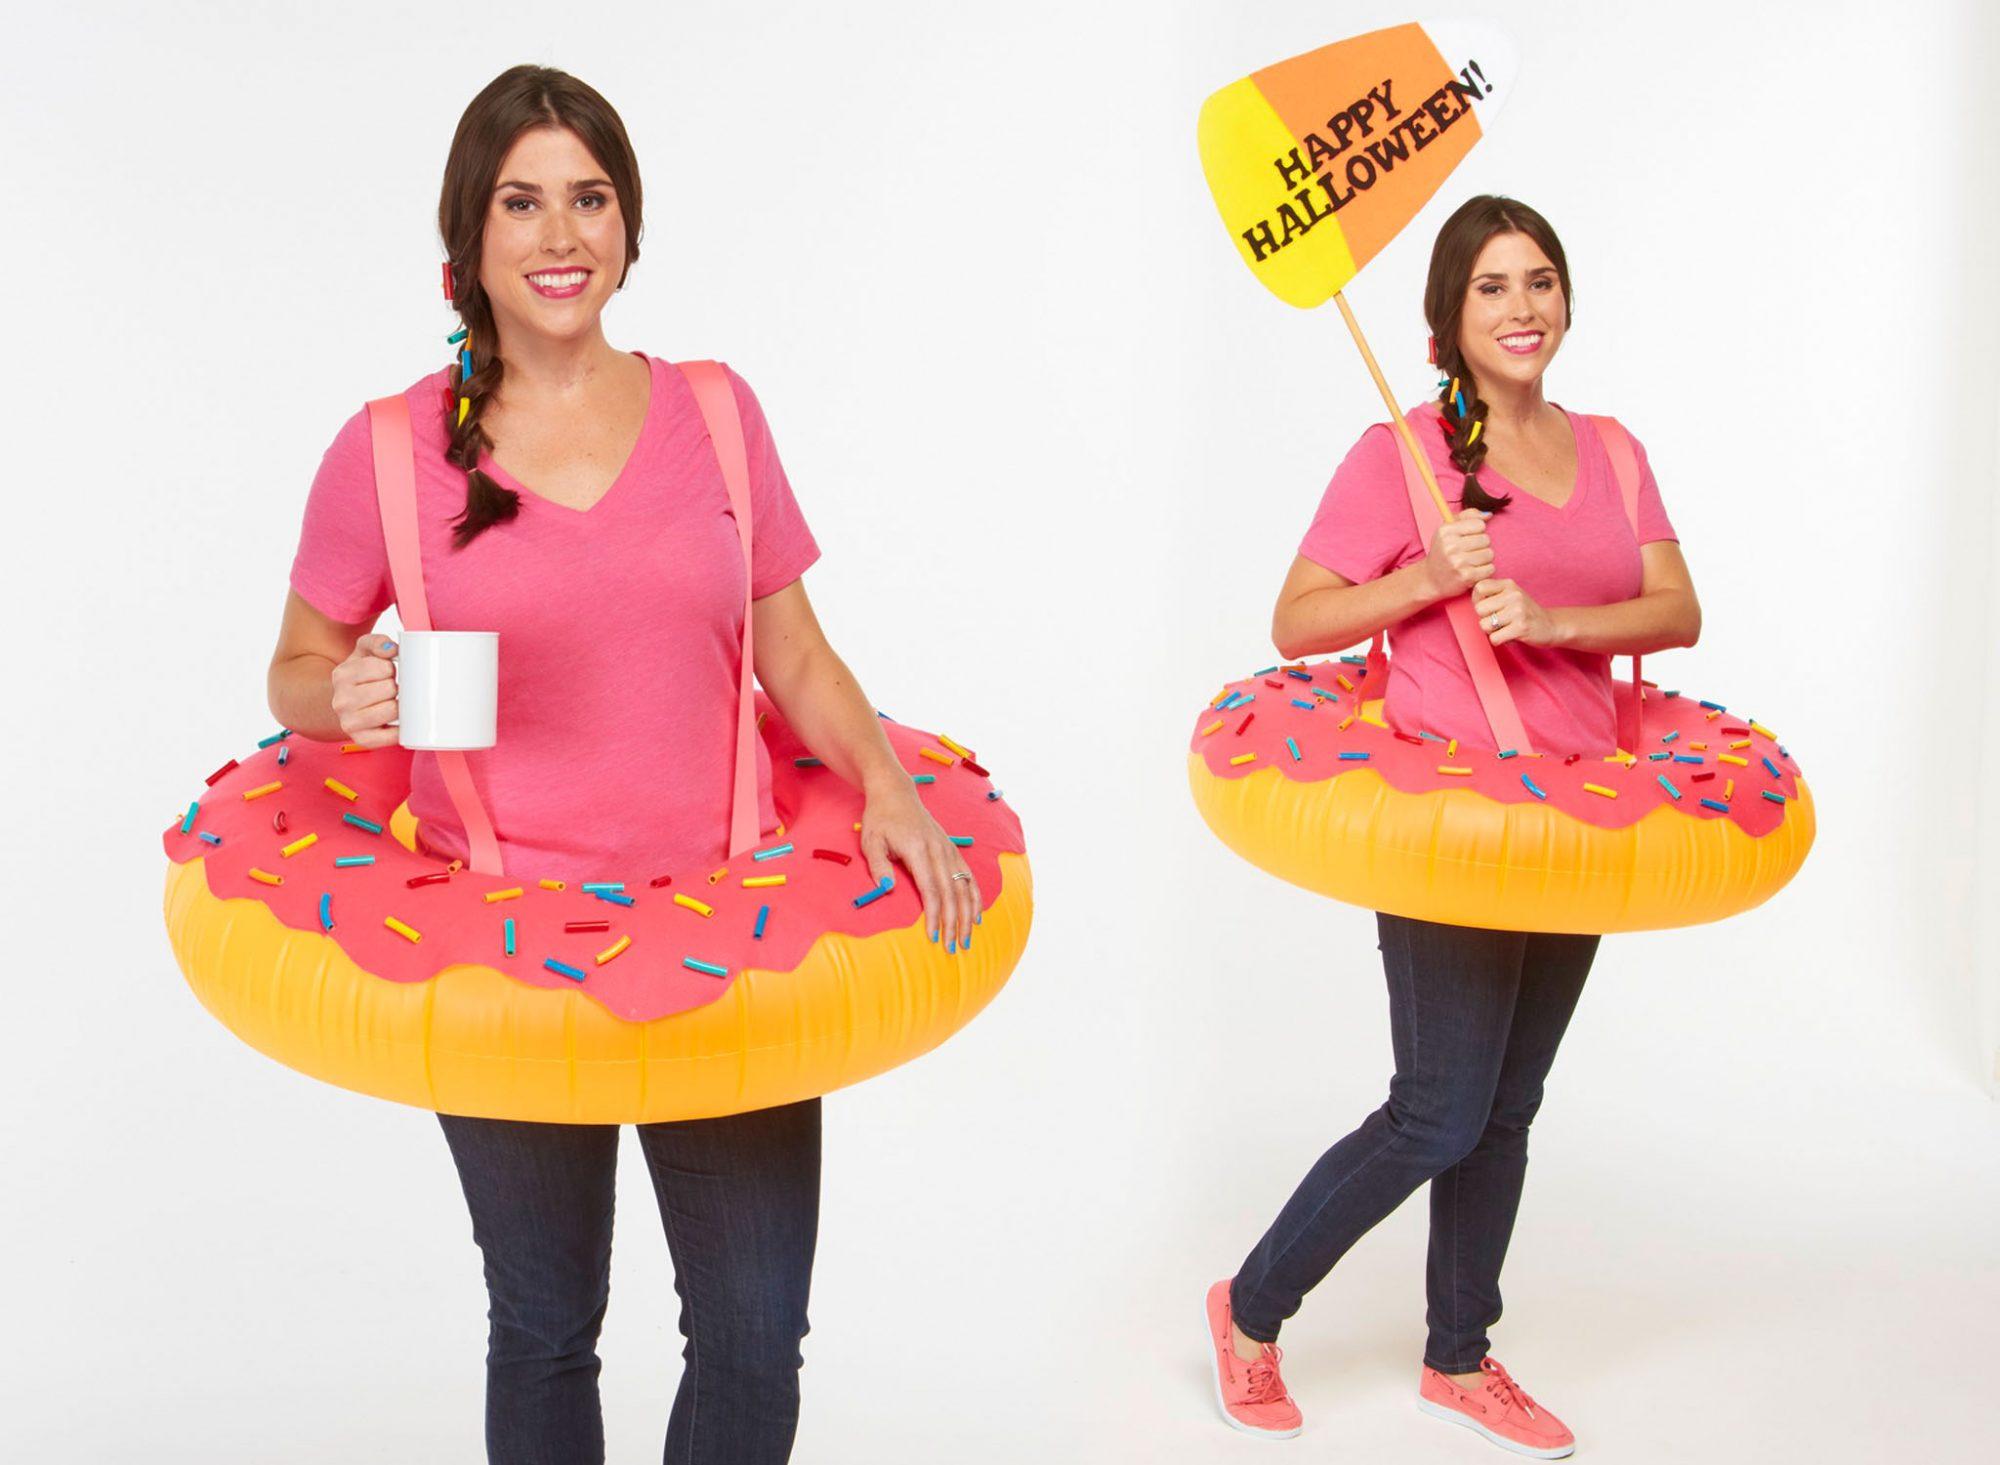 doughnut halloween costume